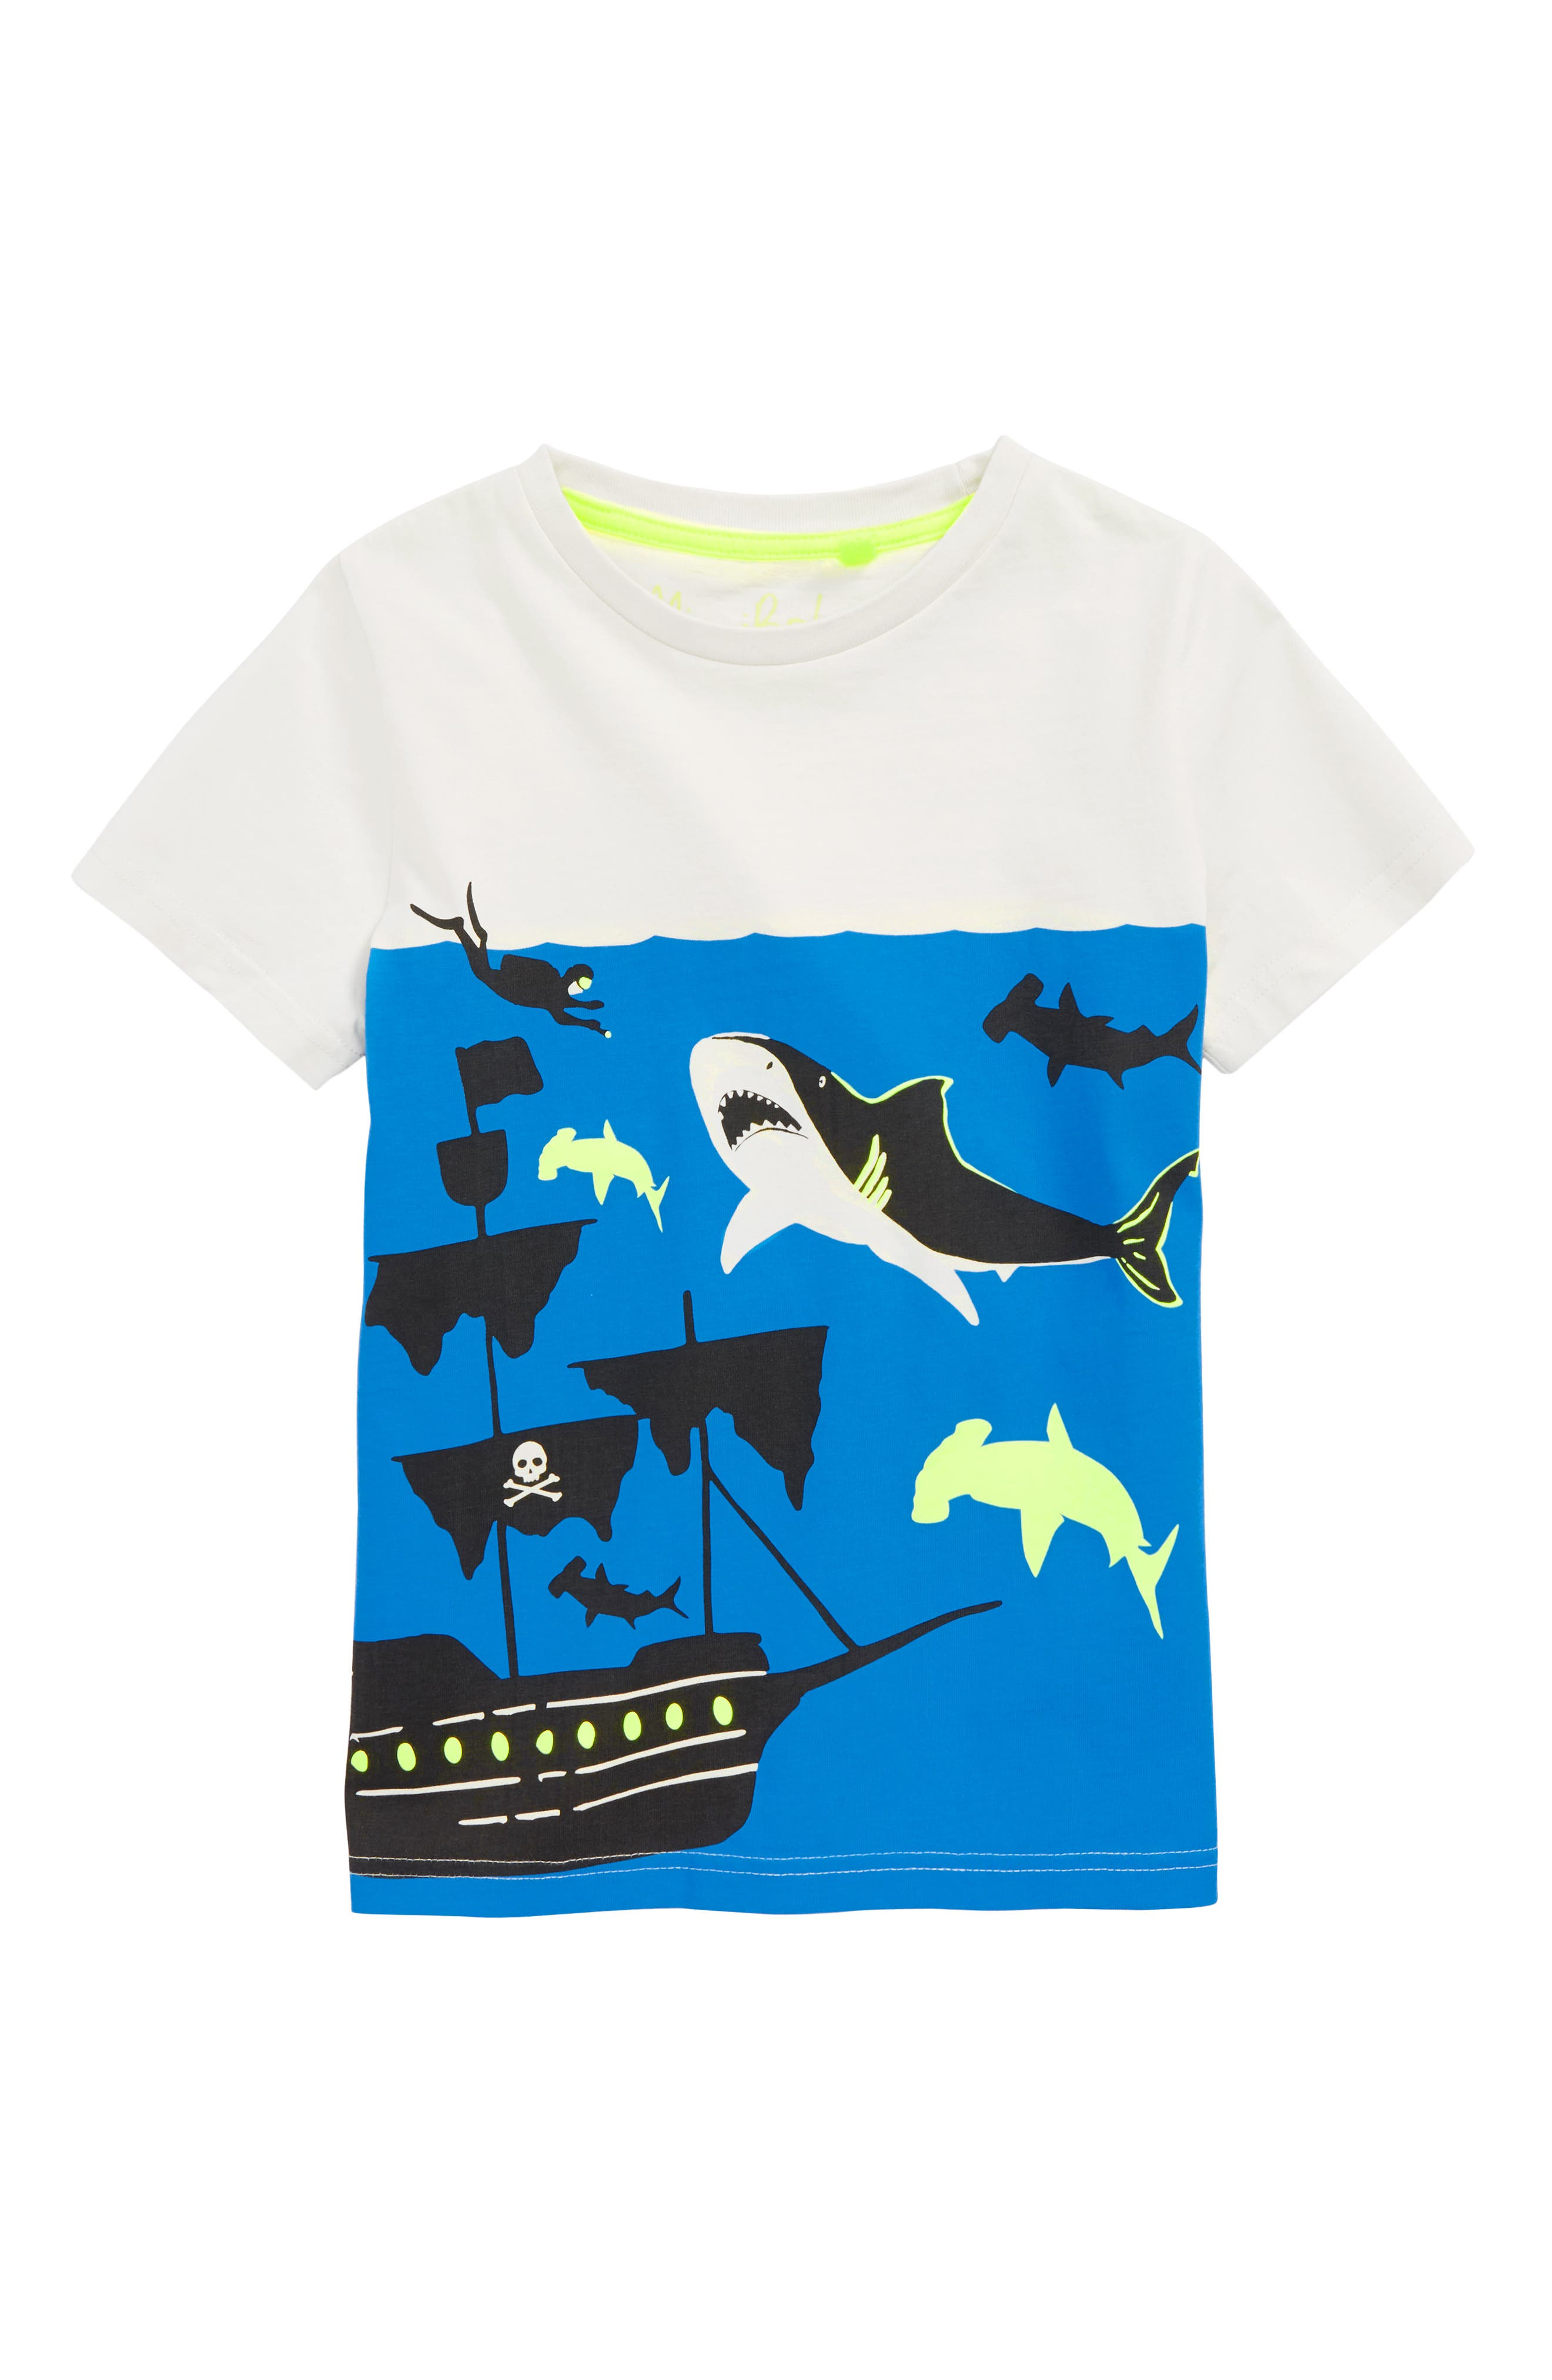 Underwater Screenprint T-Shirt,                             Main thumbnail 1, color,                             Ecru Shark Shipwreck